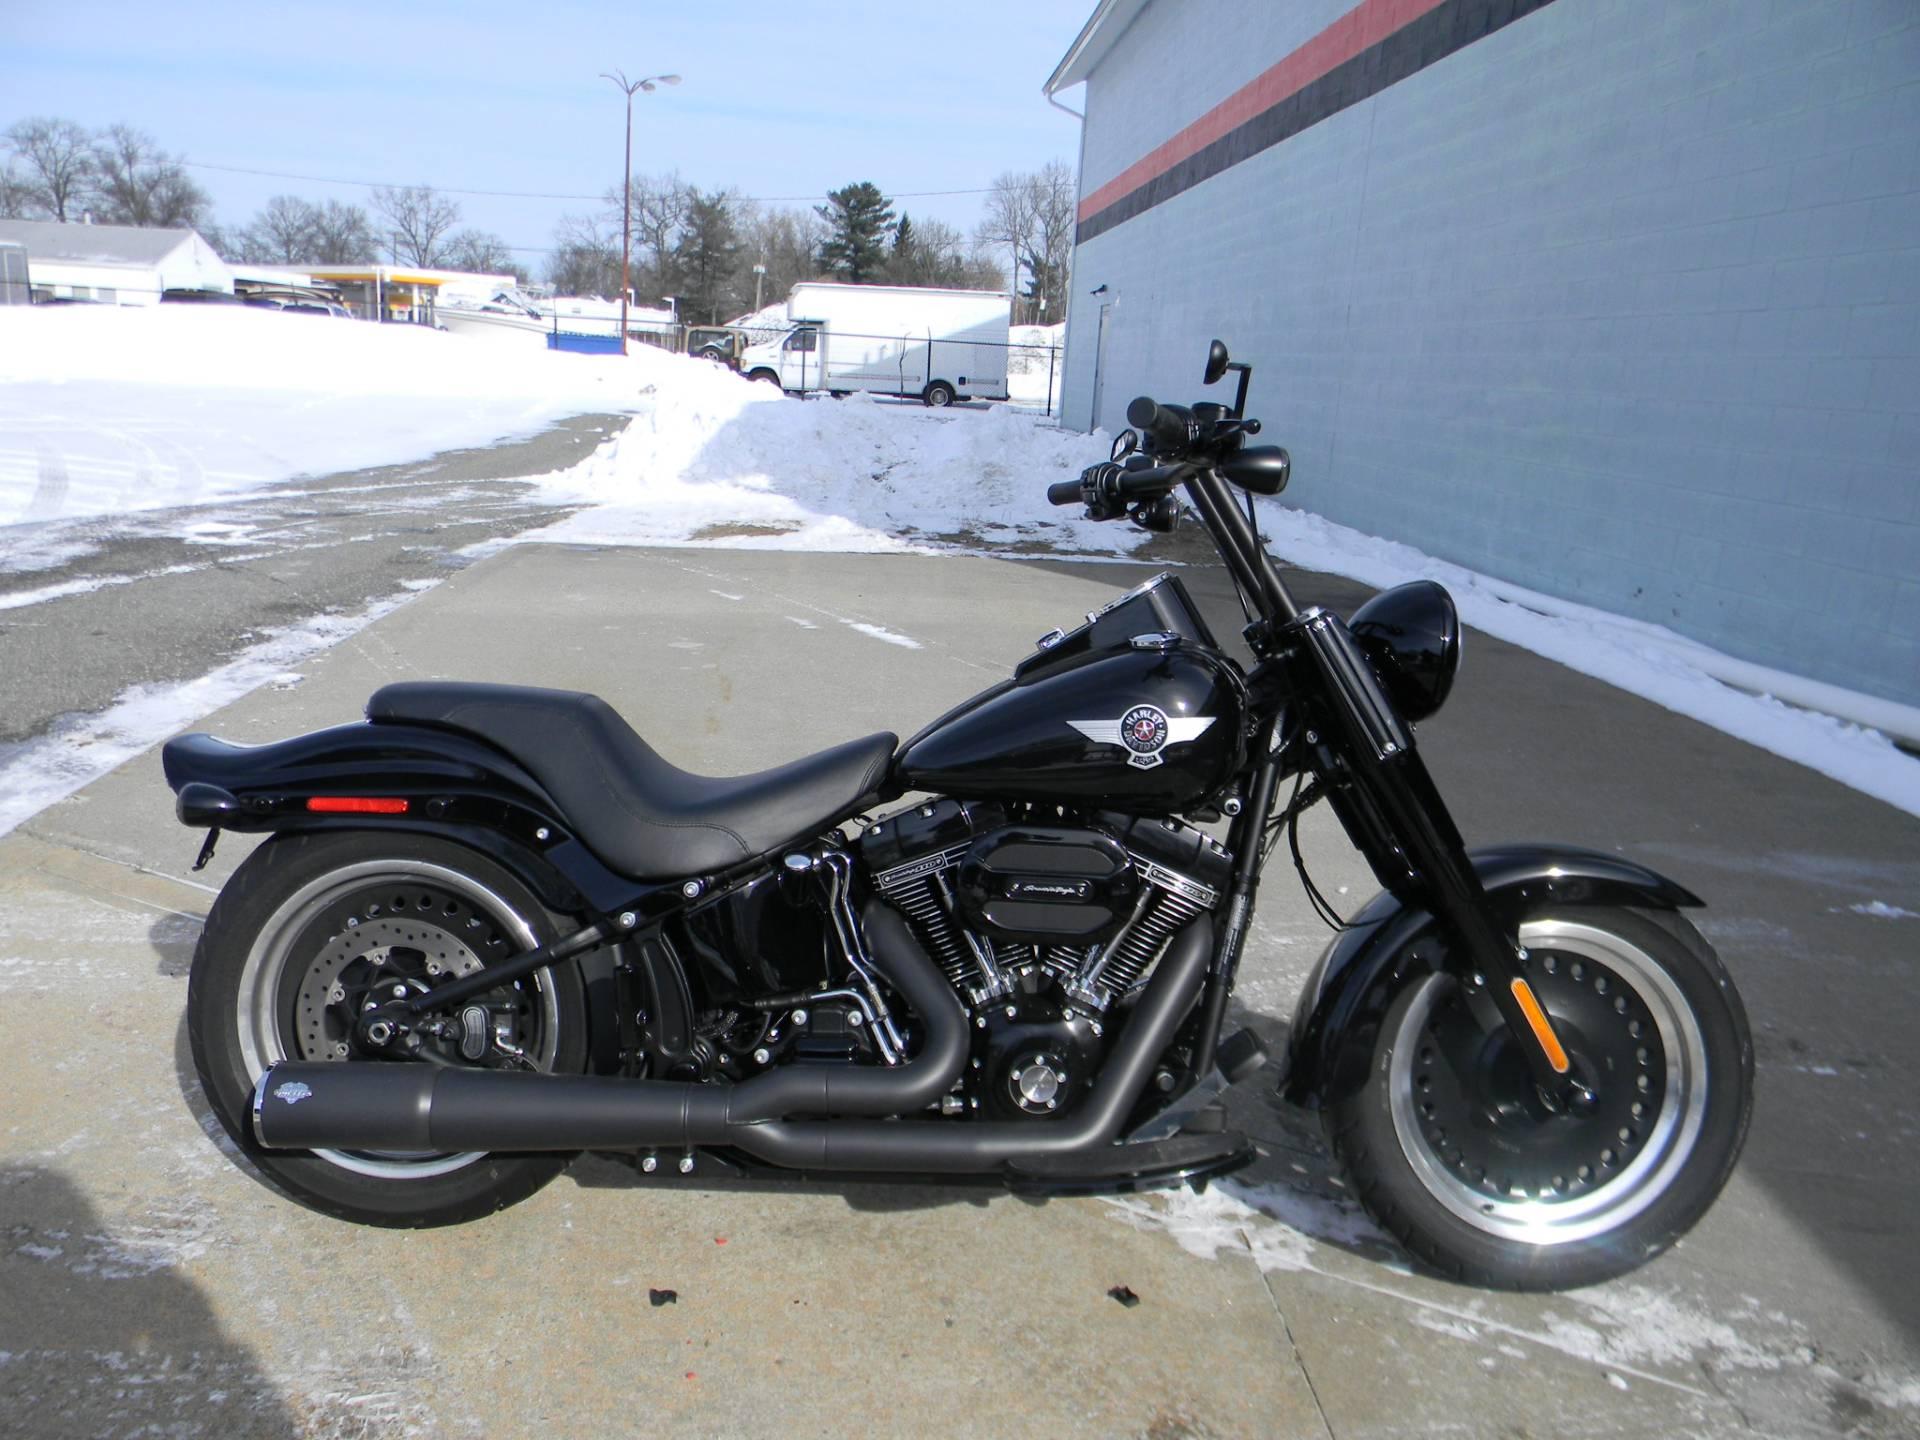 2016 Harley Davidson Fat Boy S In Springfield Machusetts